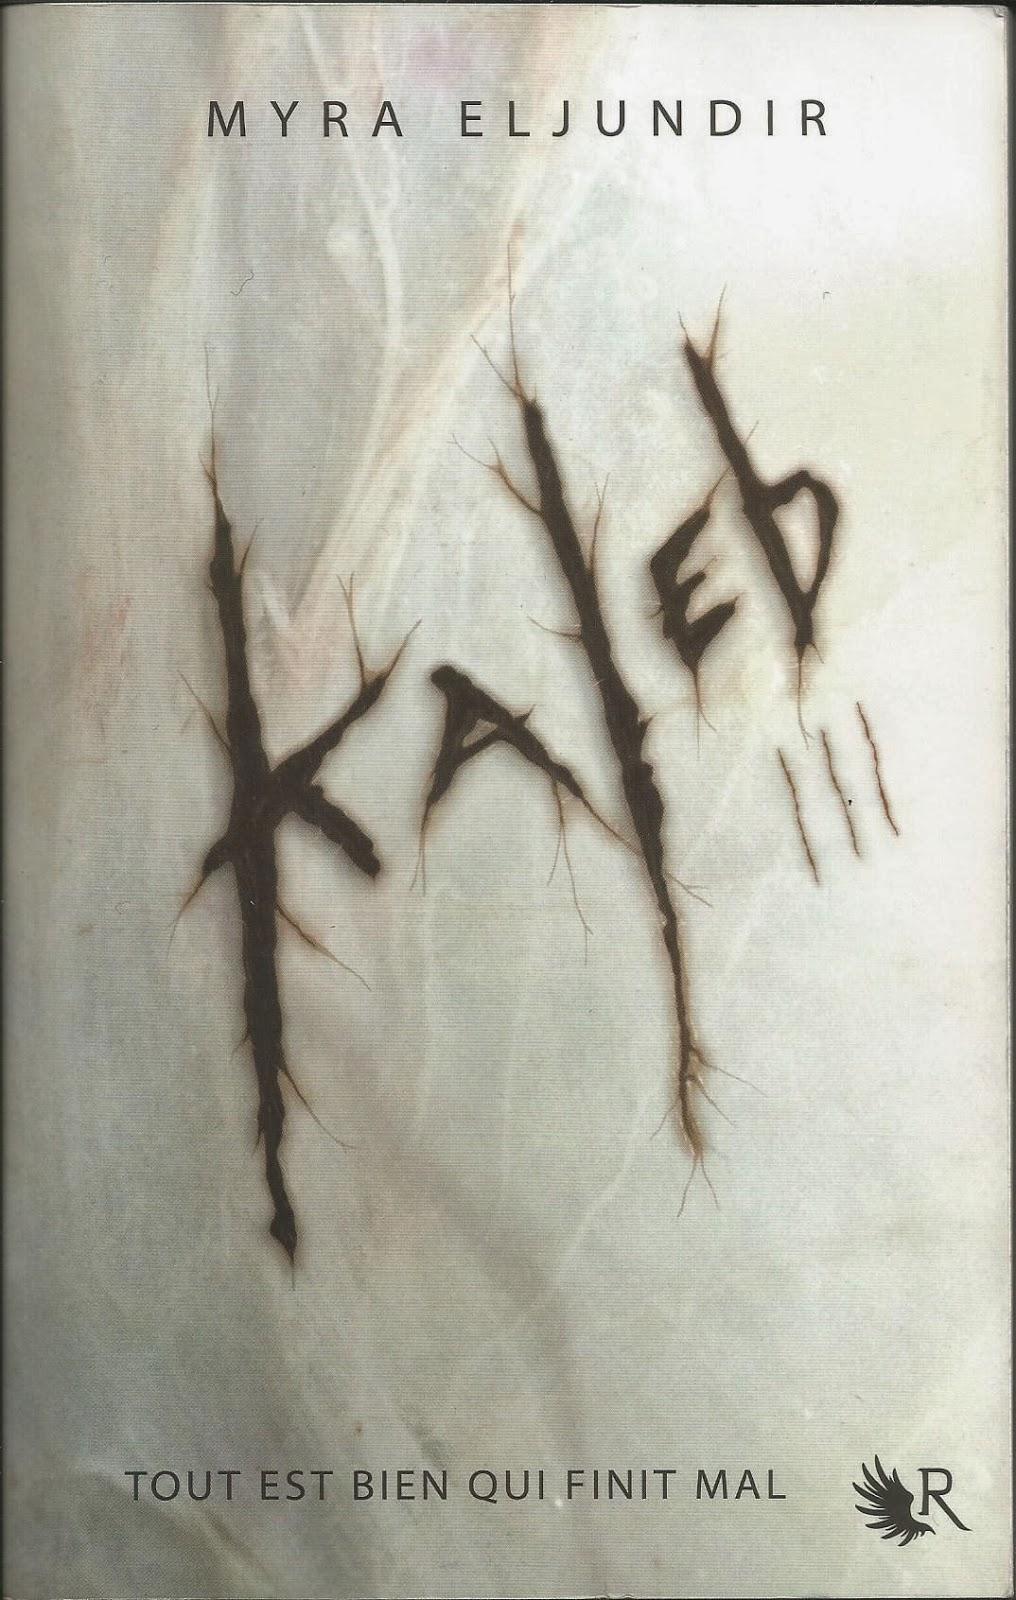 Kaleb 3 - Fusion - Myra Eljundir - Couverture